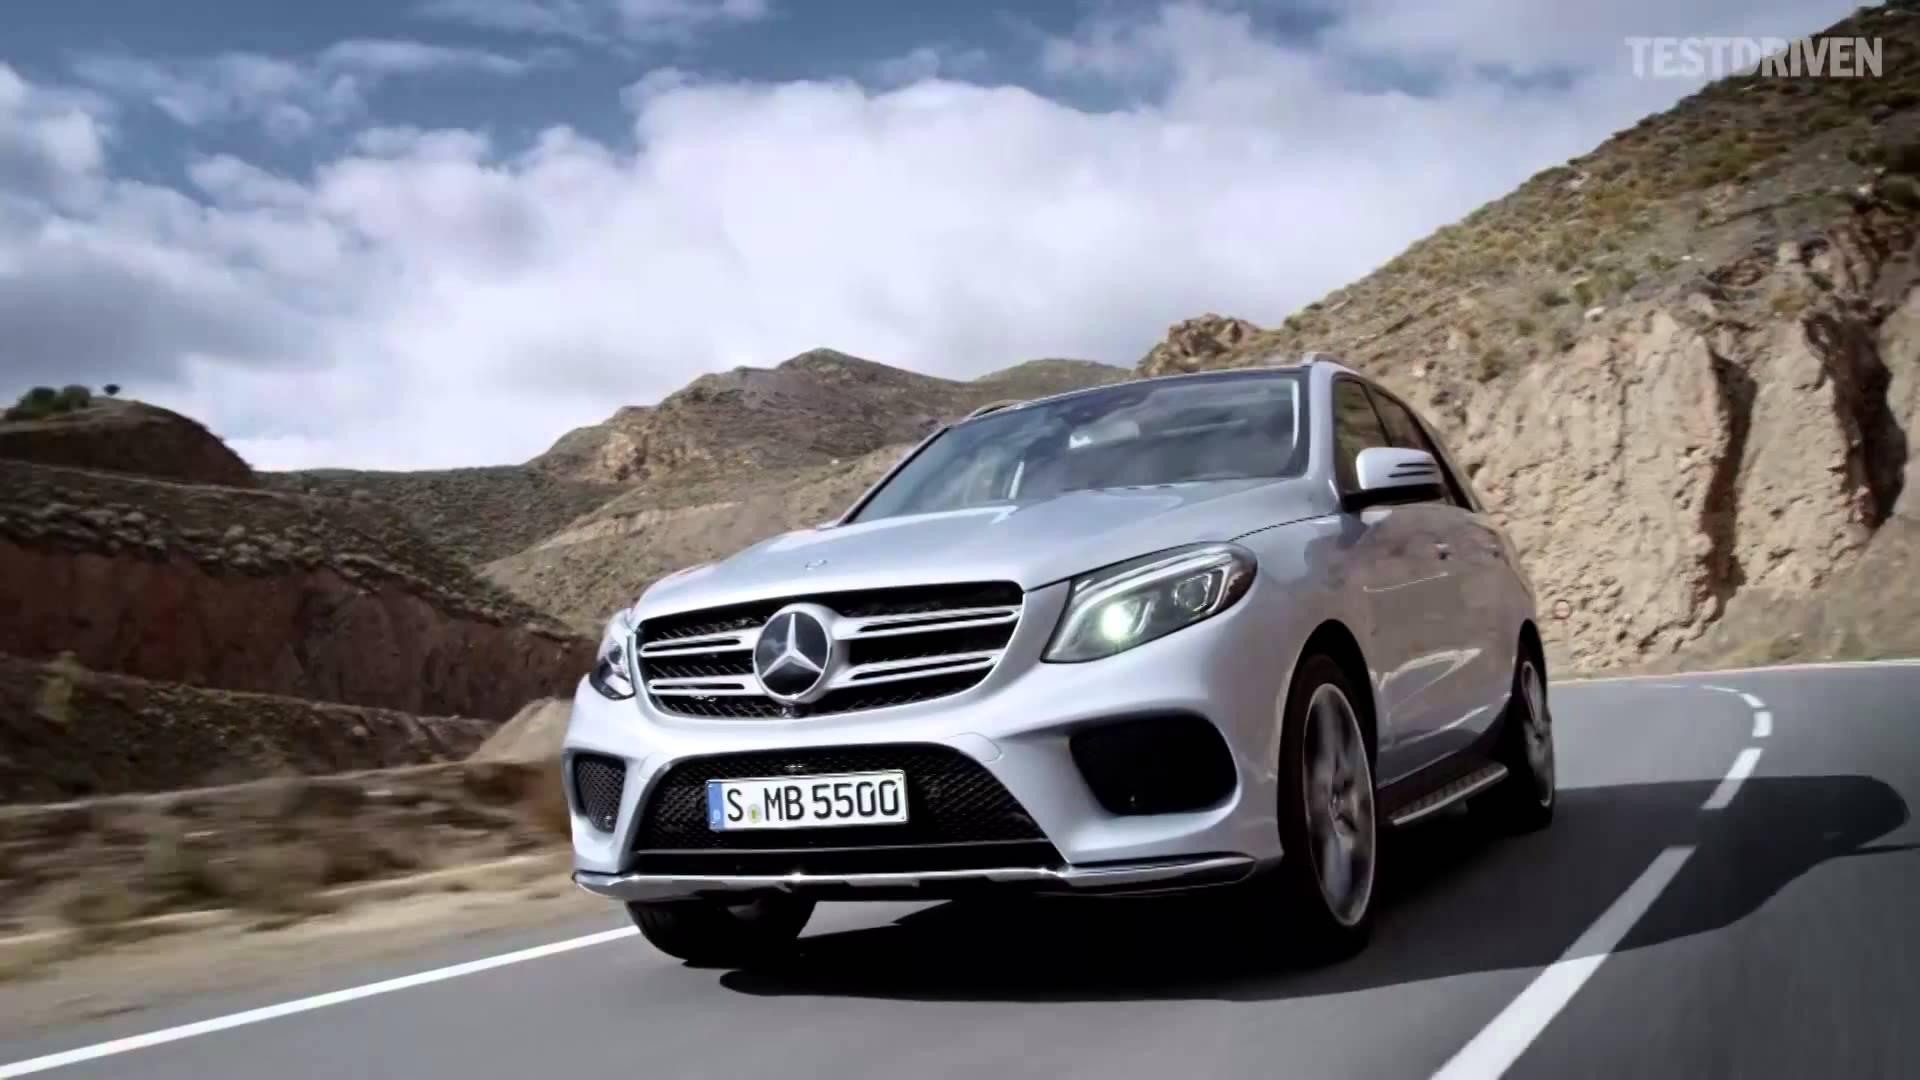 Mercedes GLE400 4MATIC 2017 10